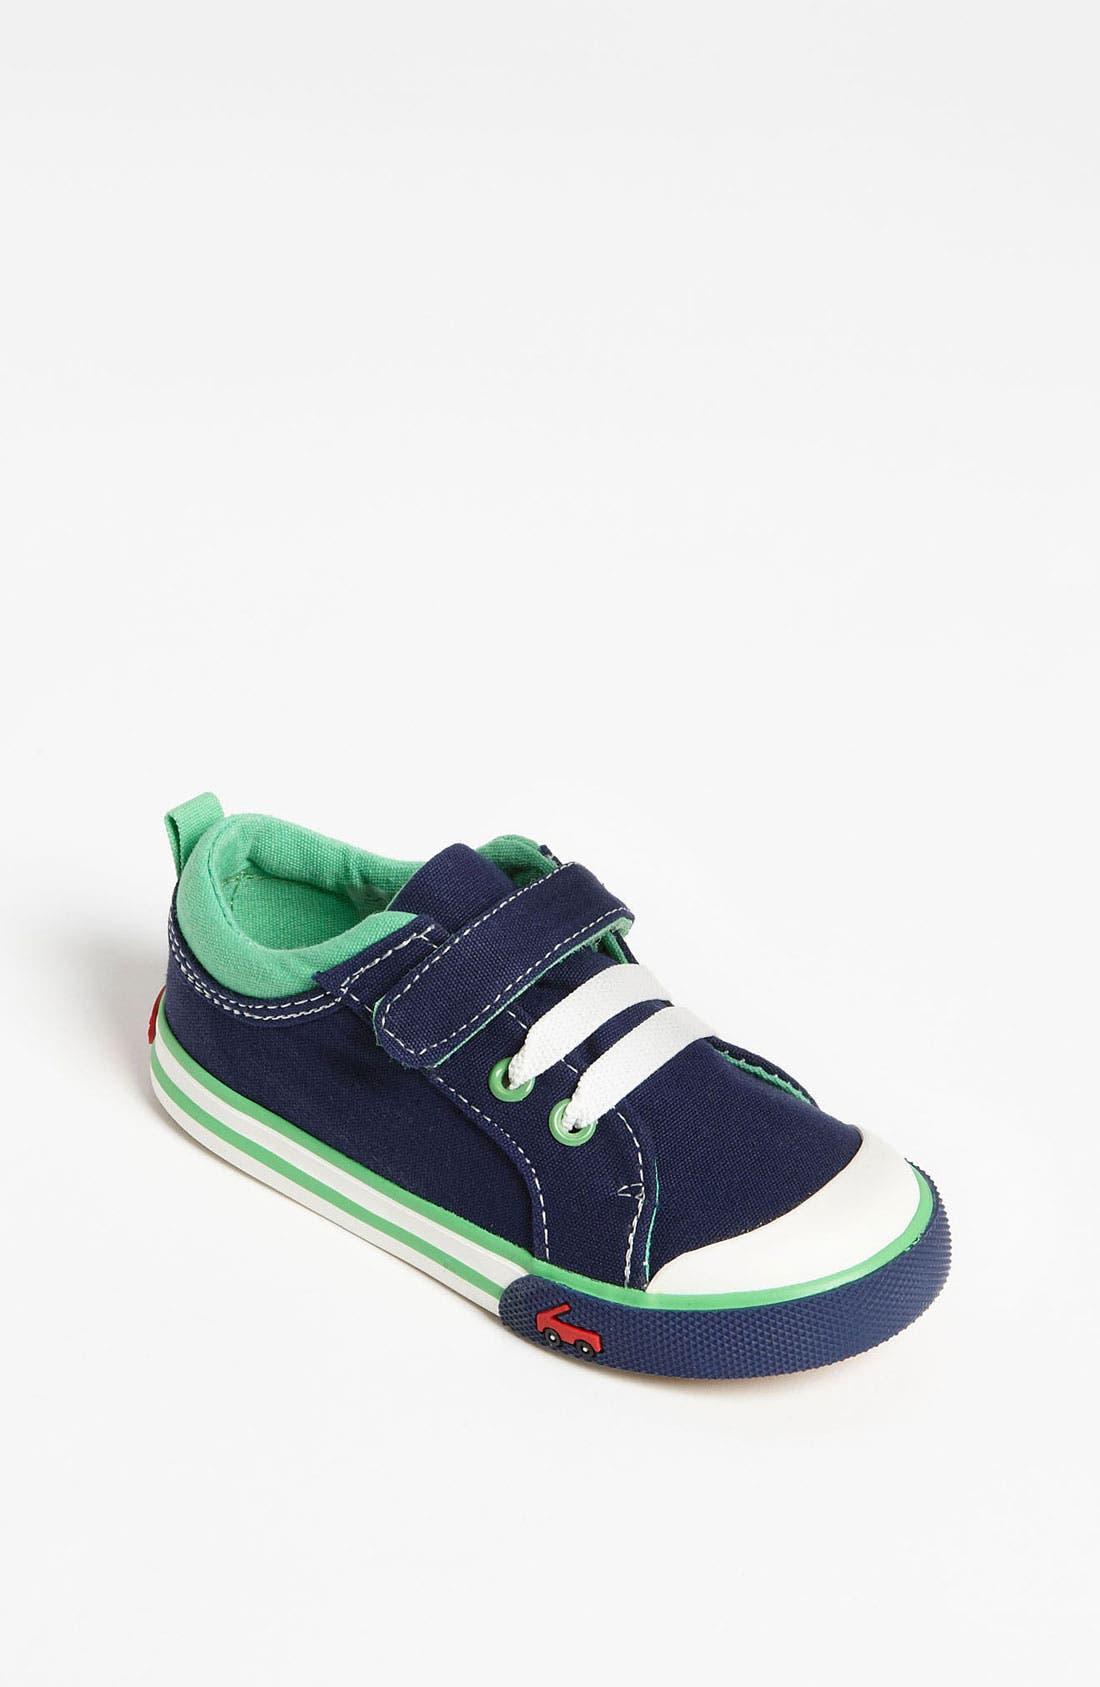 Alternate Image 1 Selected - See Kai Run 'Stevie' Sneaker (Baby, Walker & Toddler)